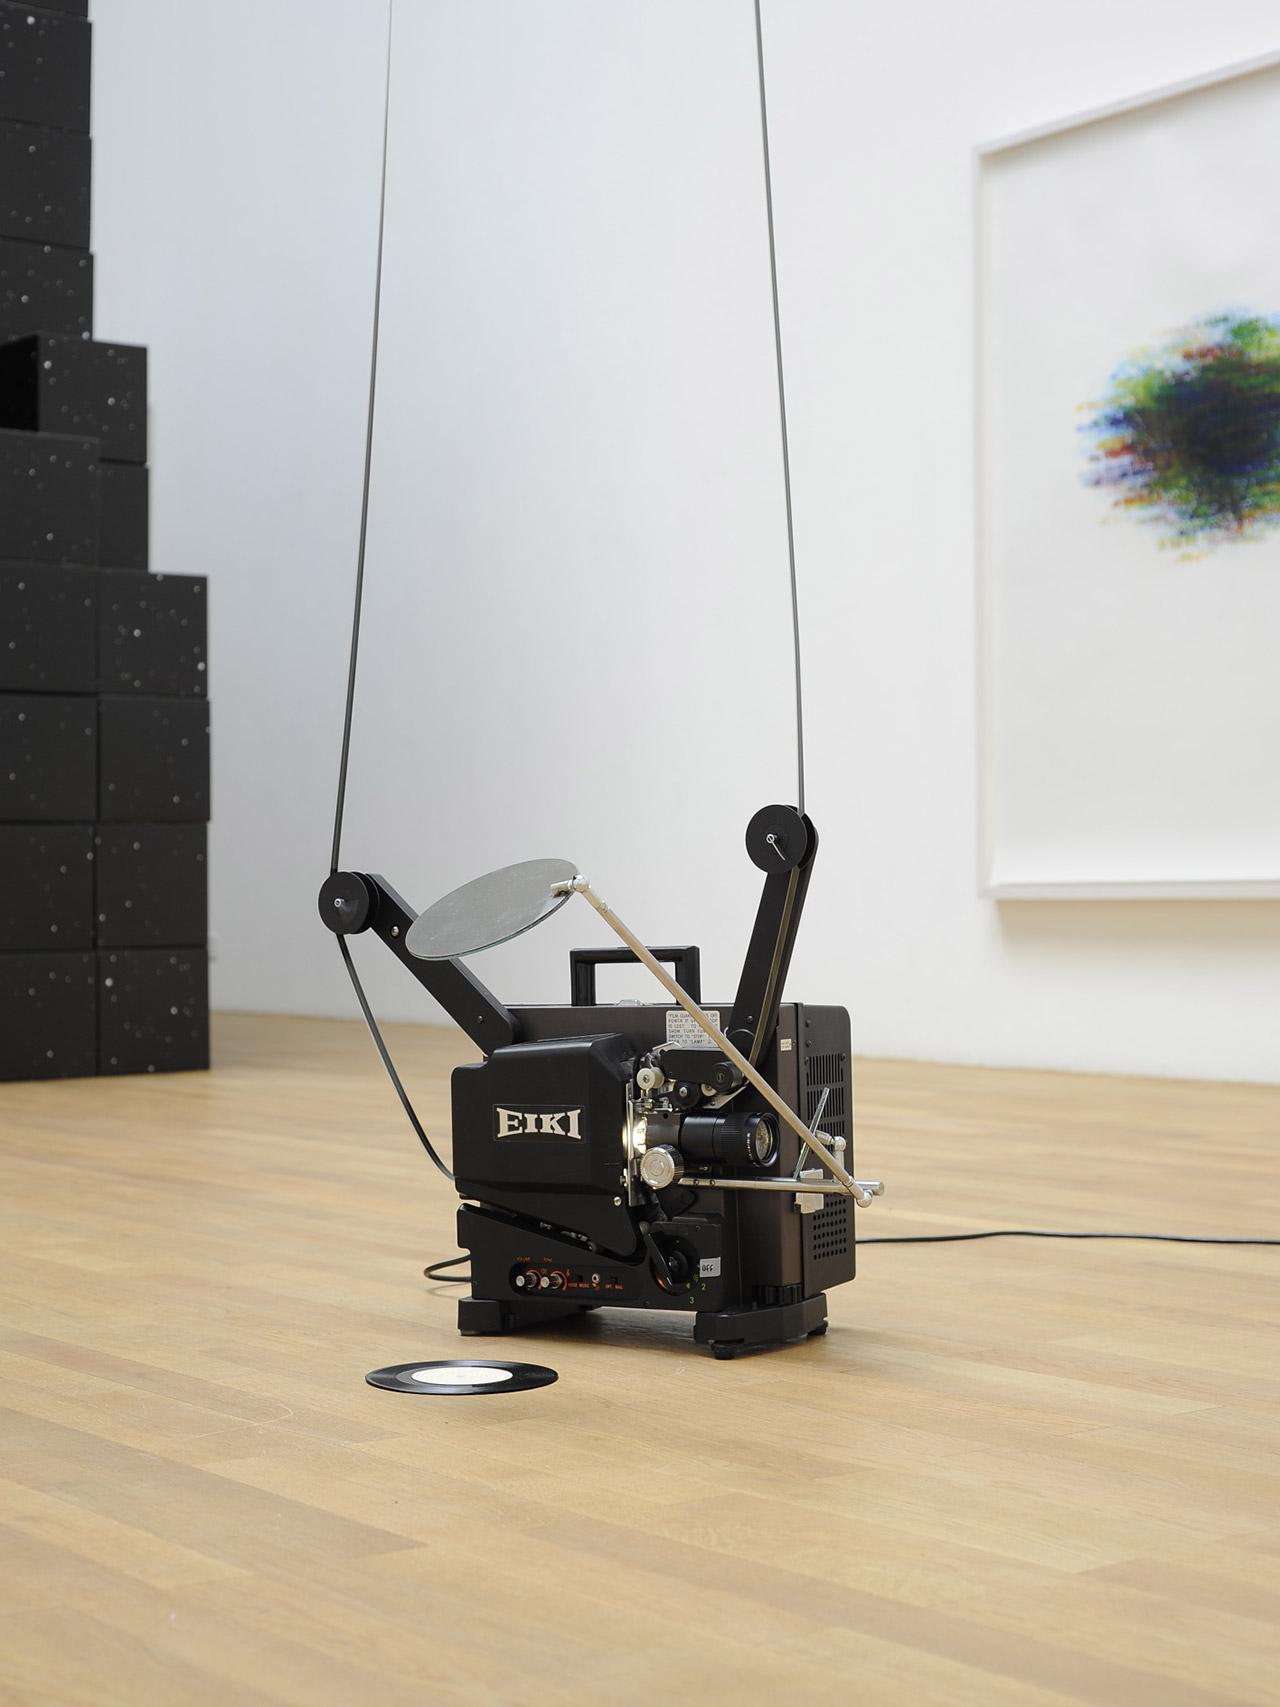 Alexander-Gutke-Kunsthalle-Winterthur-2013-2.jpg